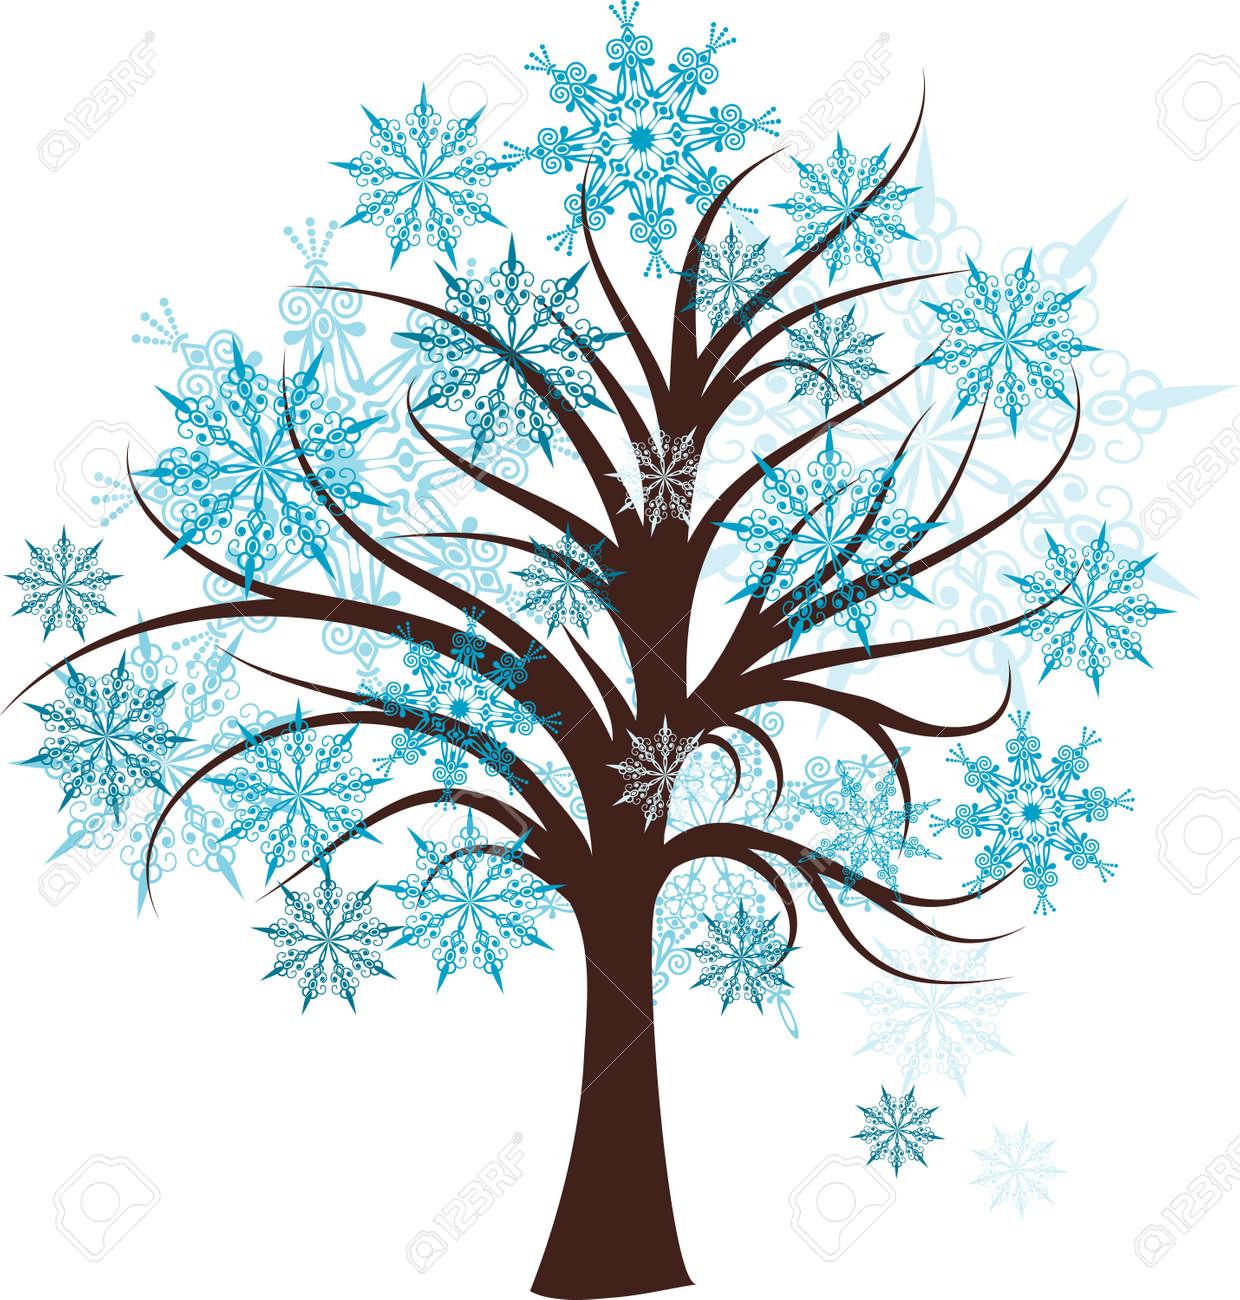 Decorative winter tree, vector illustration Stock Vector - 8969295